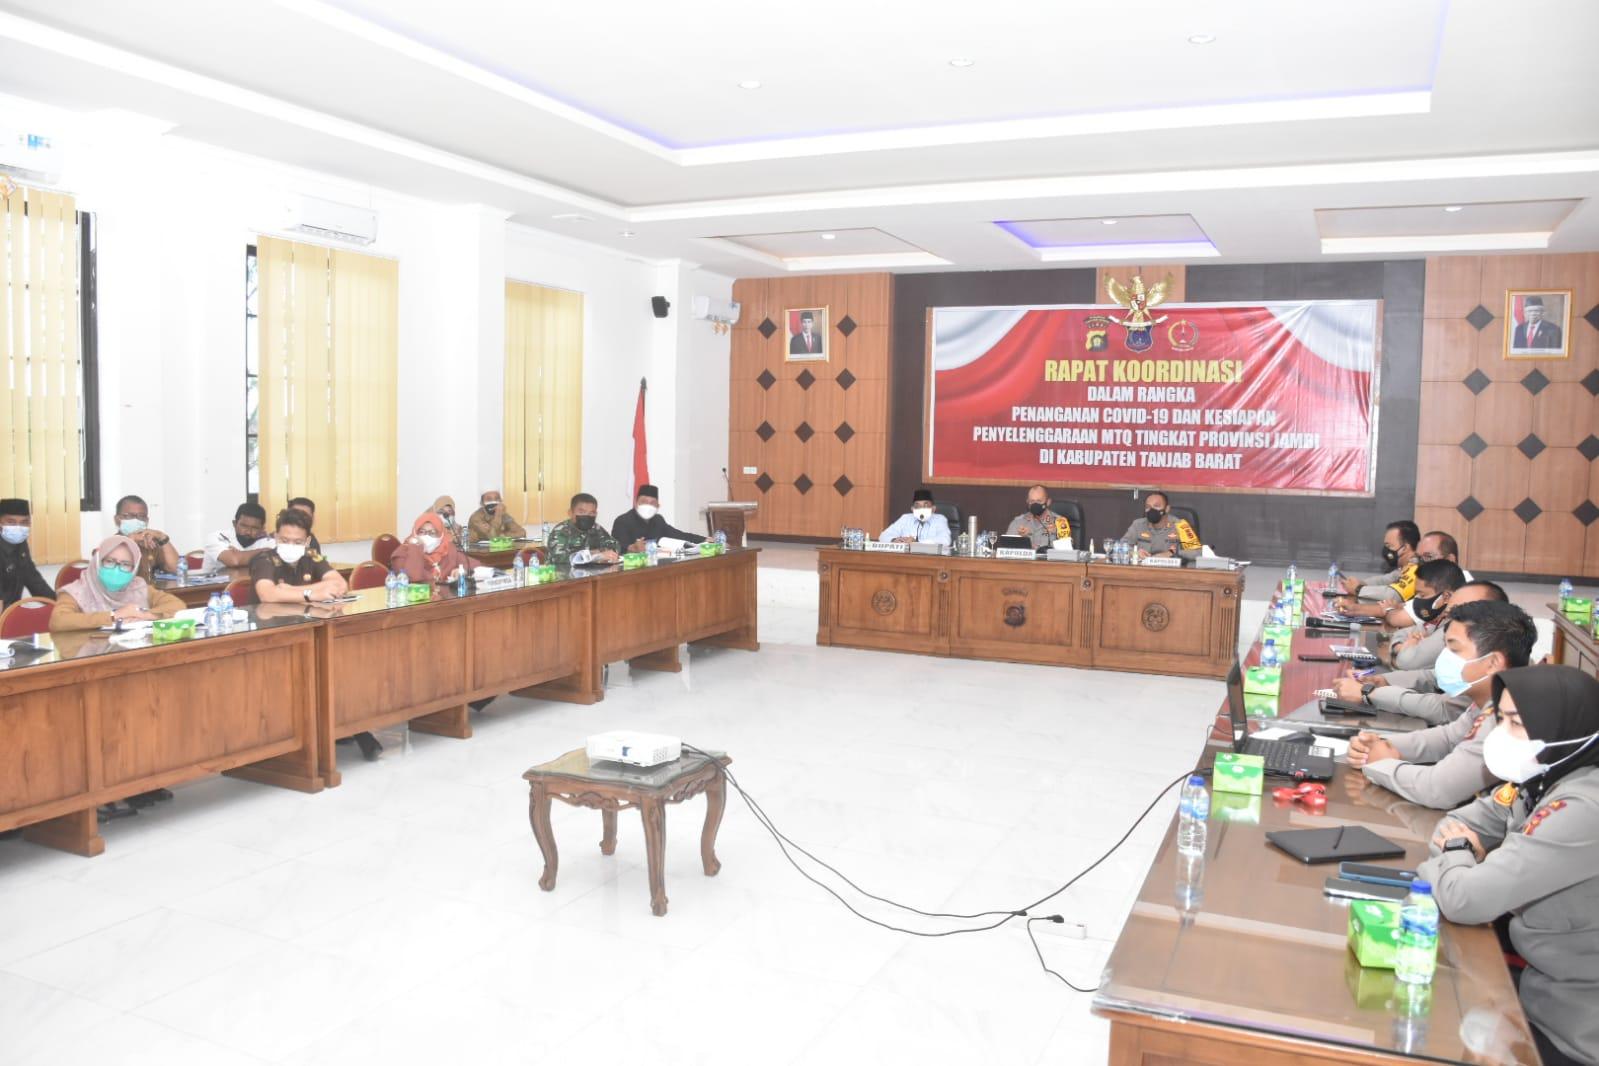 Kunker Kapolda Jambi ke-Polres Tanjabbar Dalam Rangka Penangan Covid-19 dan Kesiapan Kegiatan MTQ Ke-50 Tingkat Provinsi Jambi